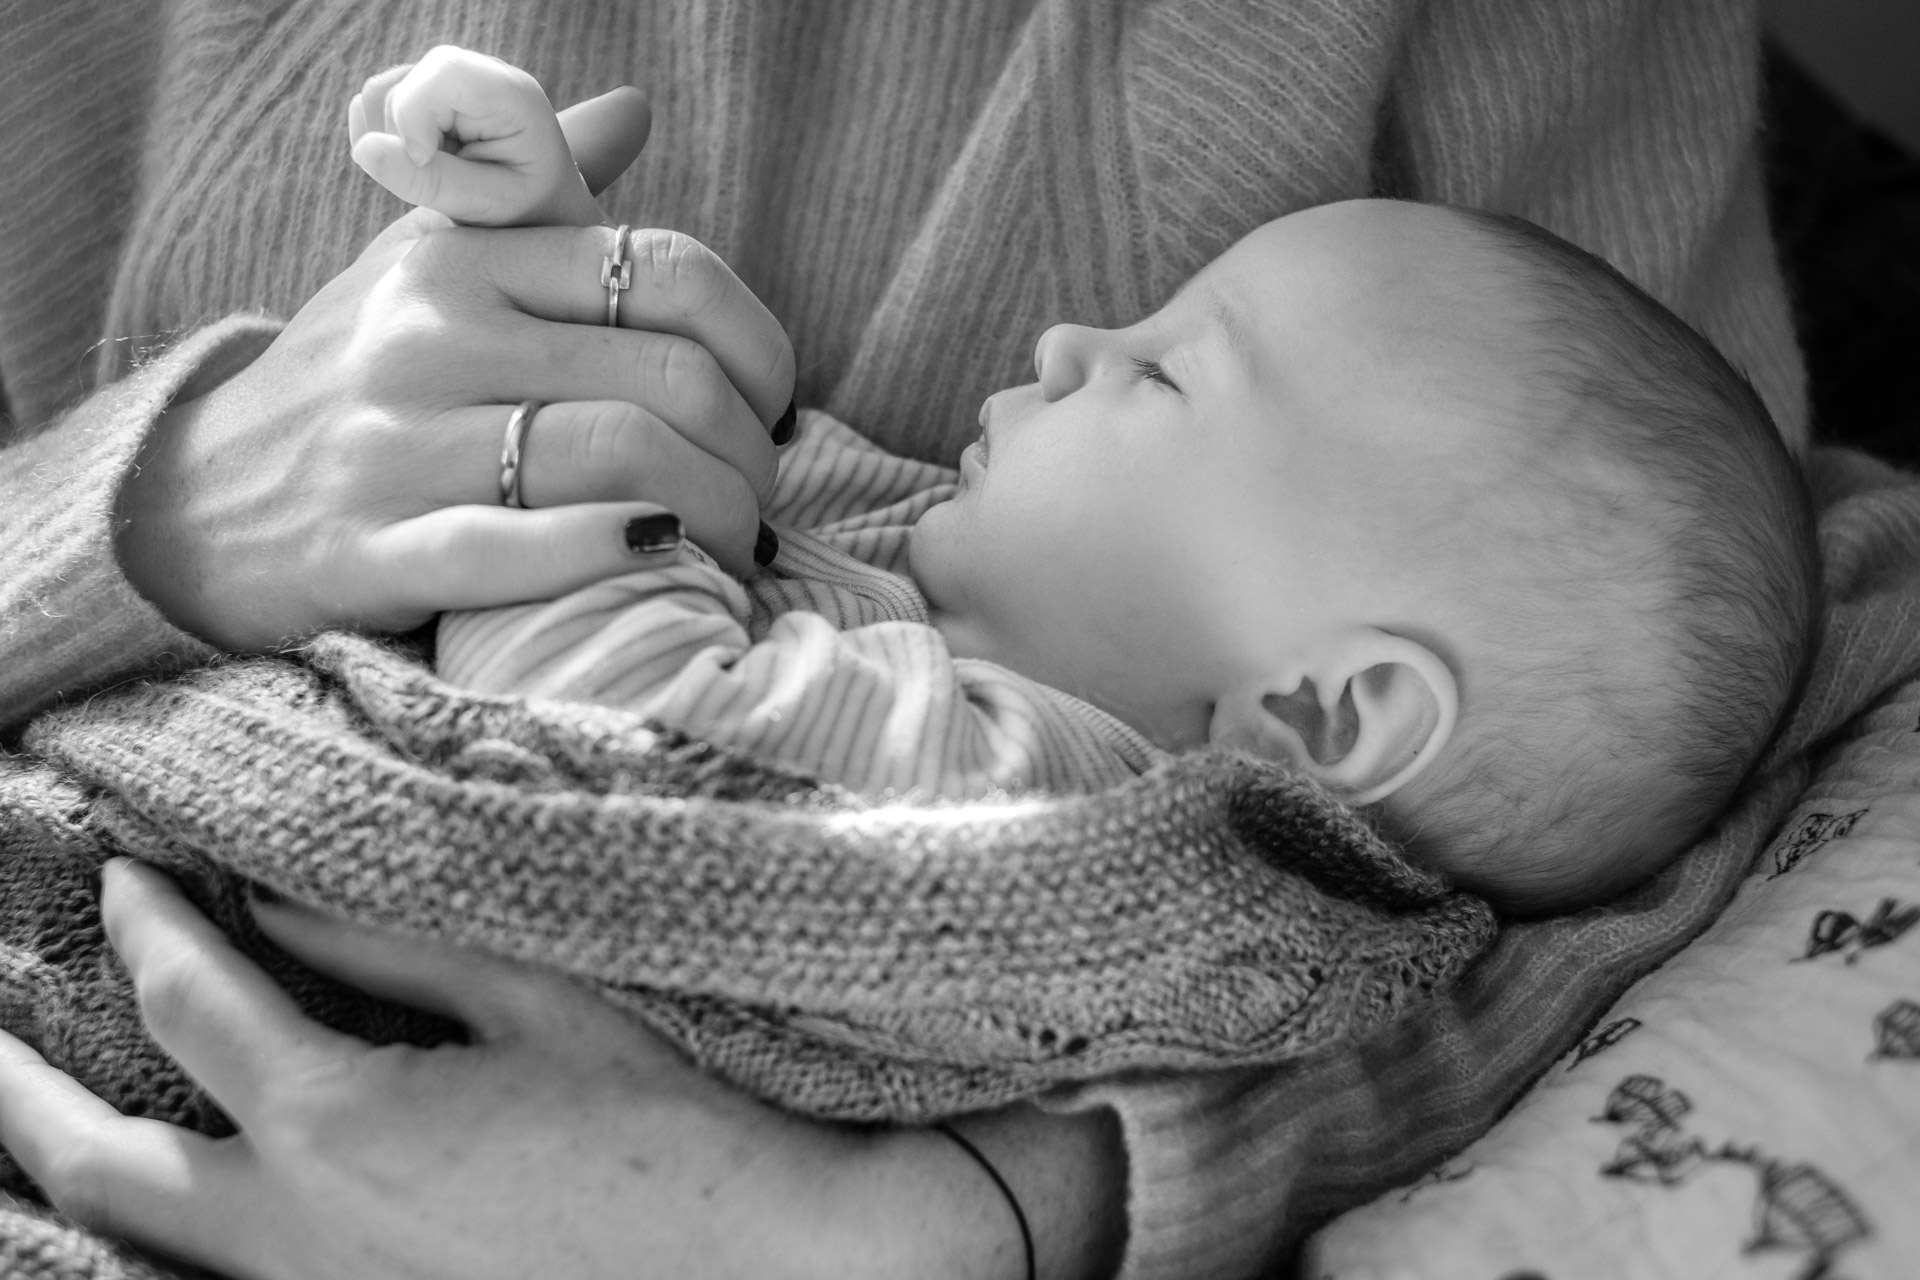 Nyfødt baby ligger i armkroken til en voksen.